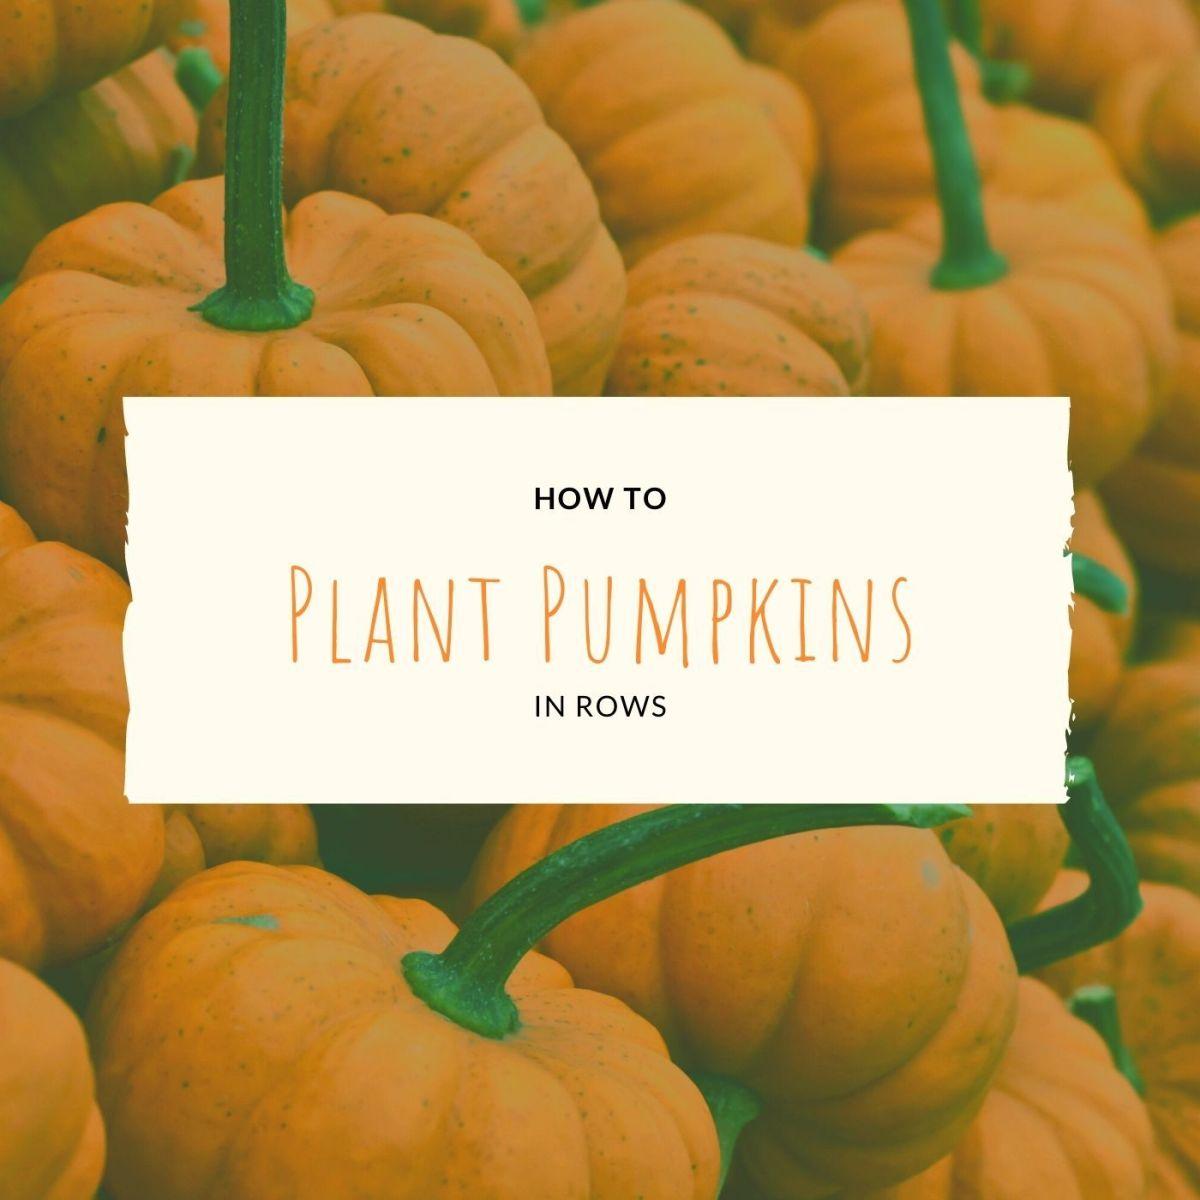 How to Plant Pumpkins: Rows vs. Hills